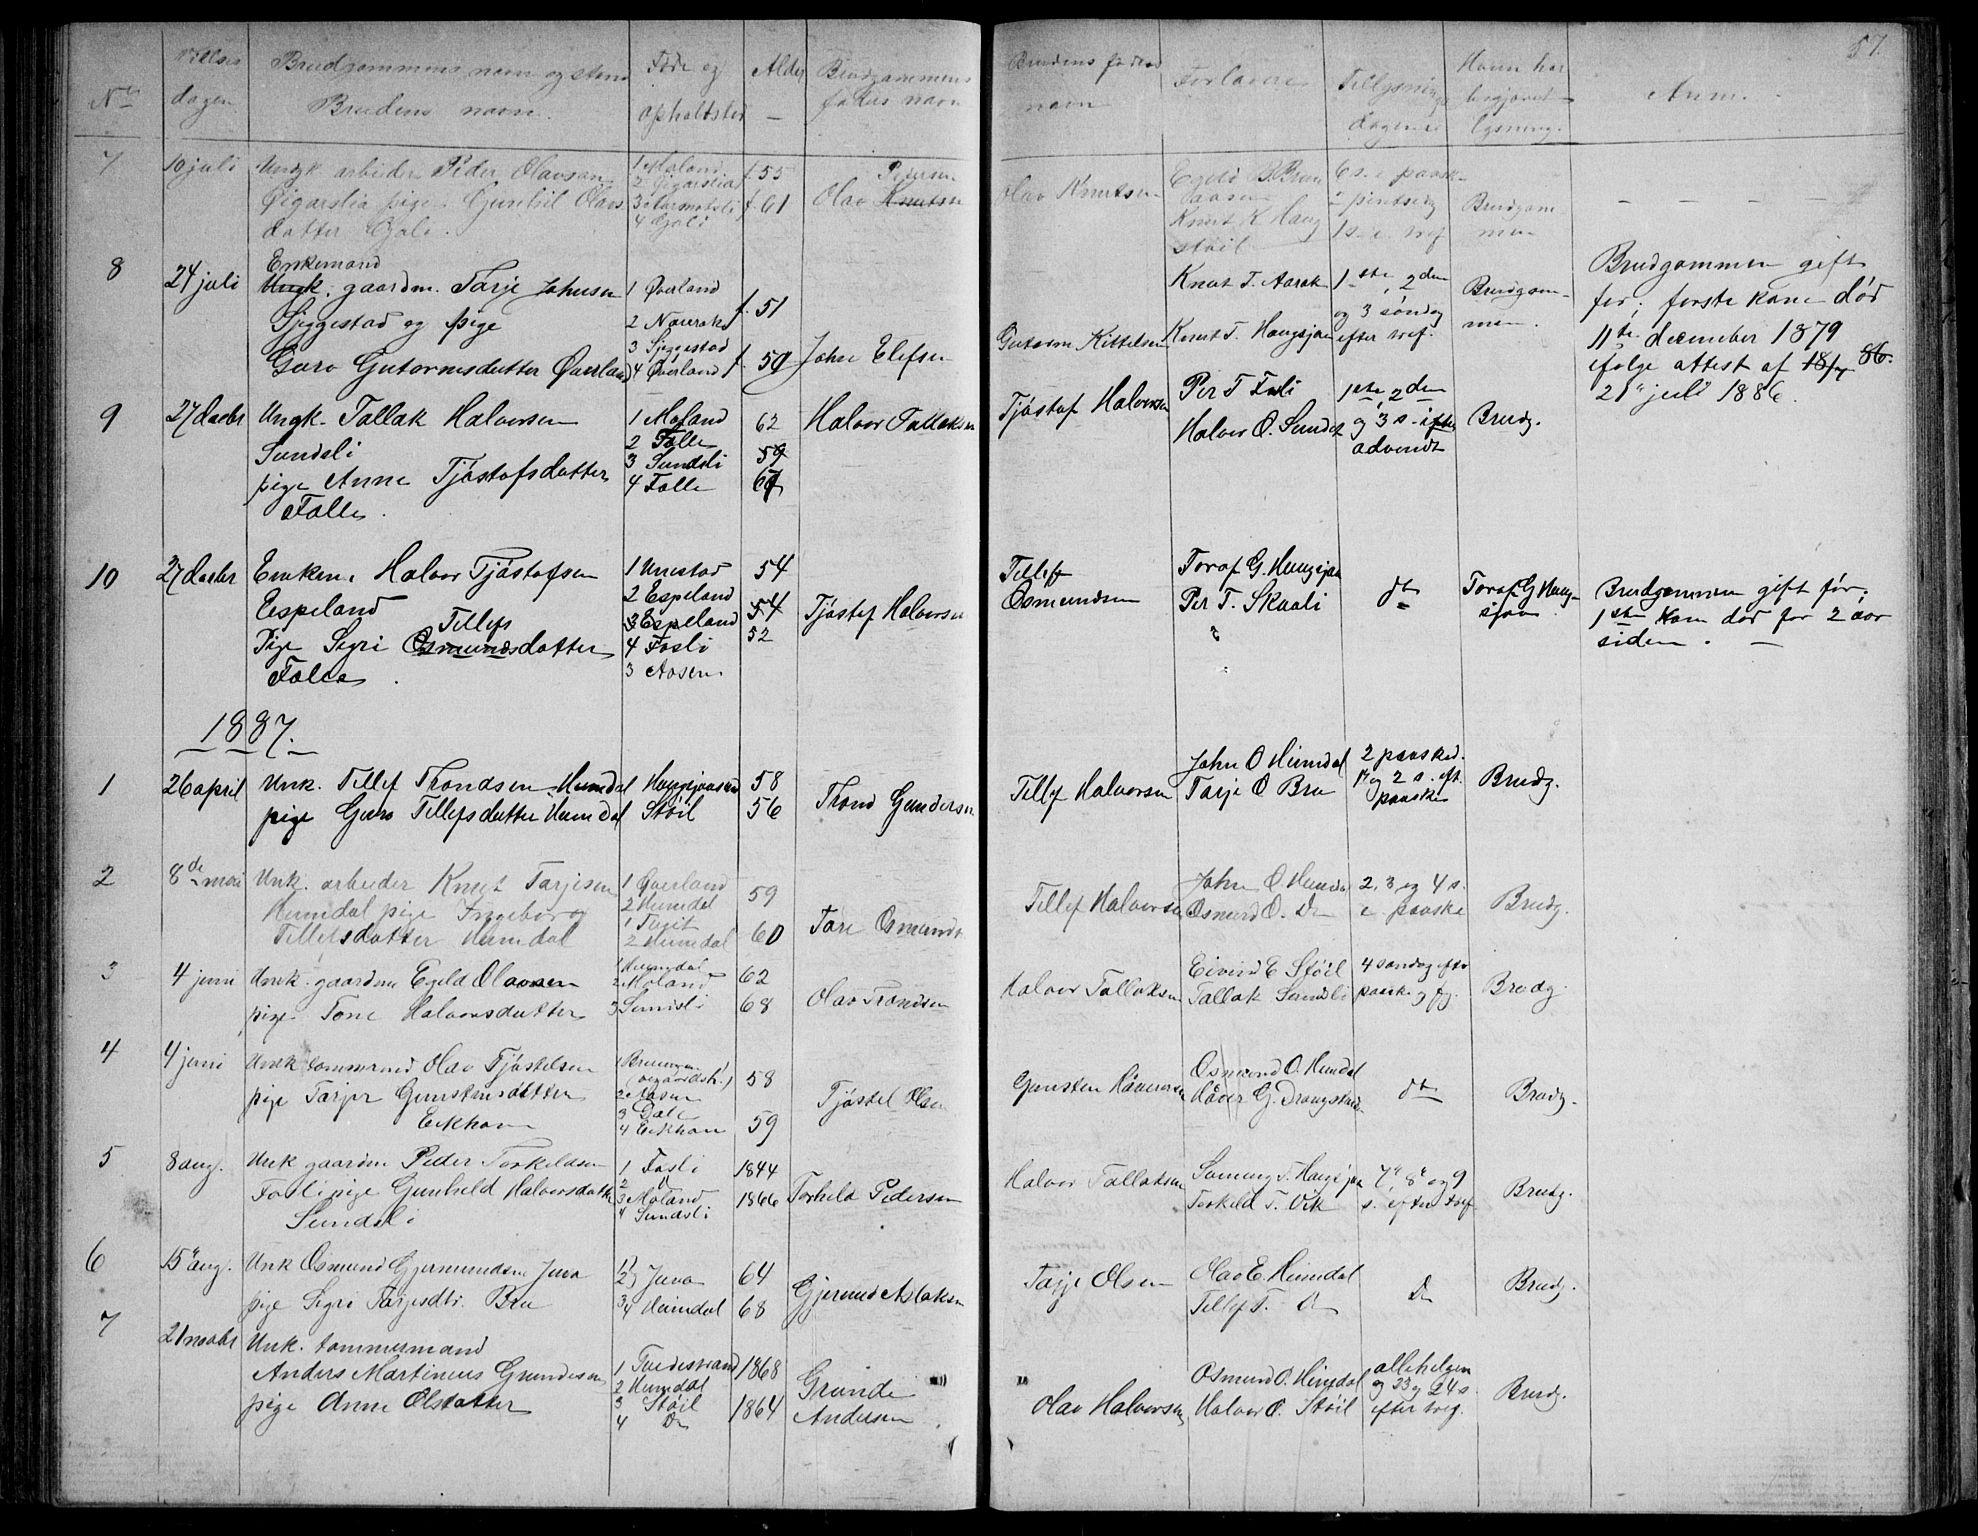 SAKO, Nissedal kirkebøker, G/Gb/L0002: Klokkerbok nr. II 2, 1863-1892, s. 57